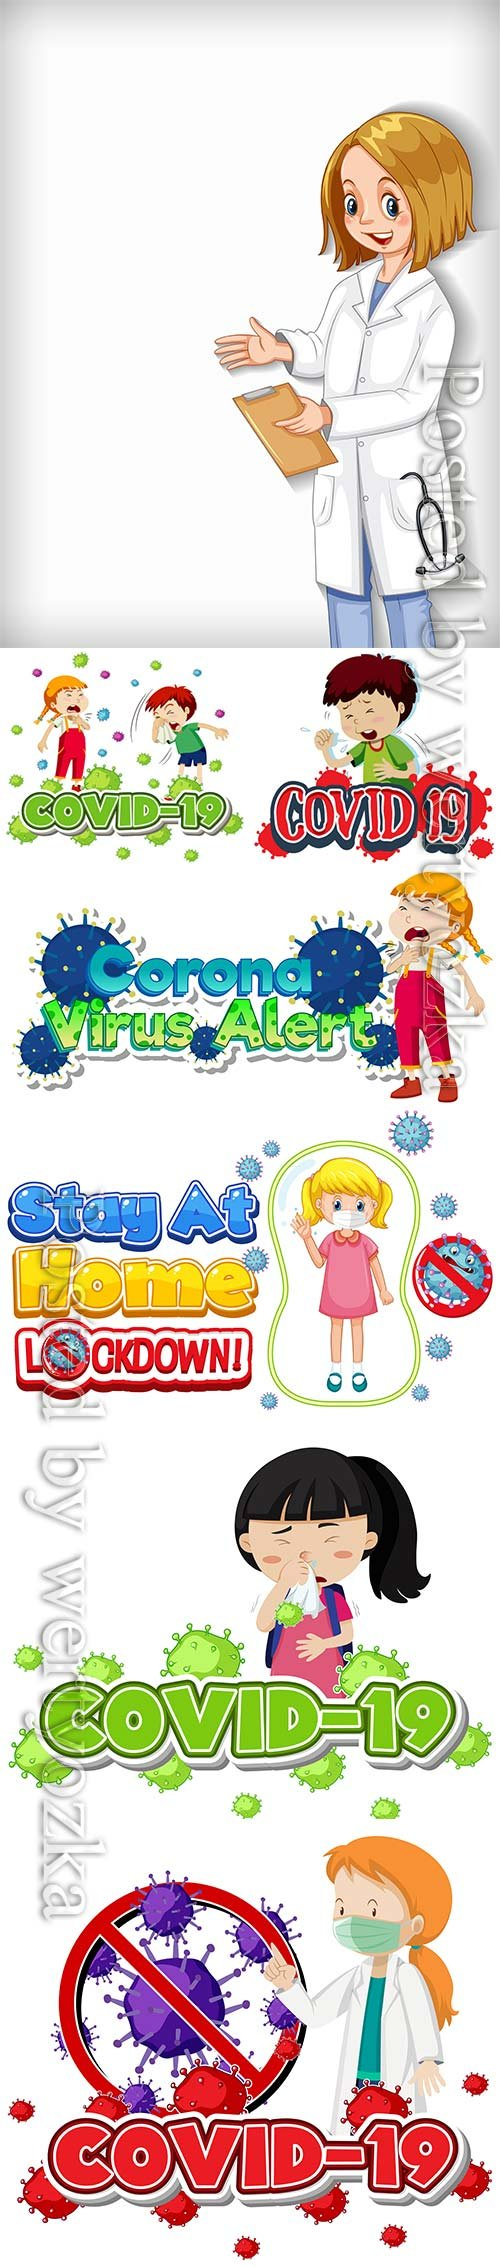 Coronavirus, medicine and people concept vector # 9